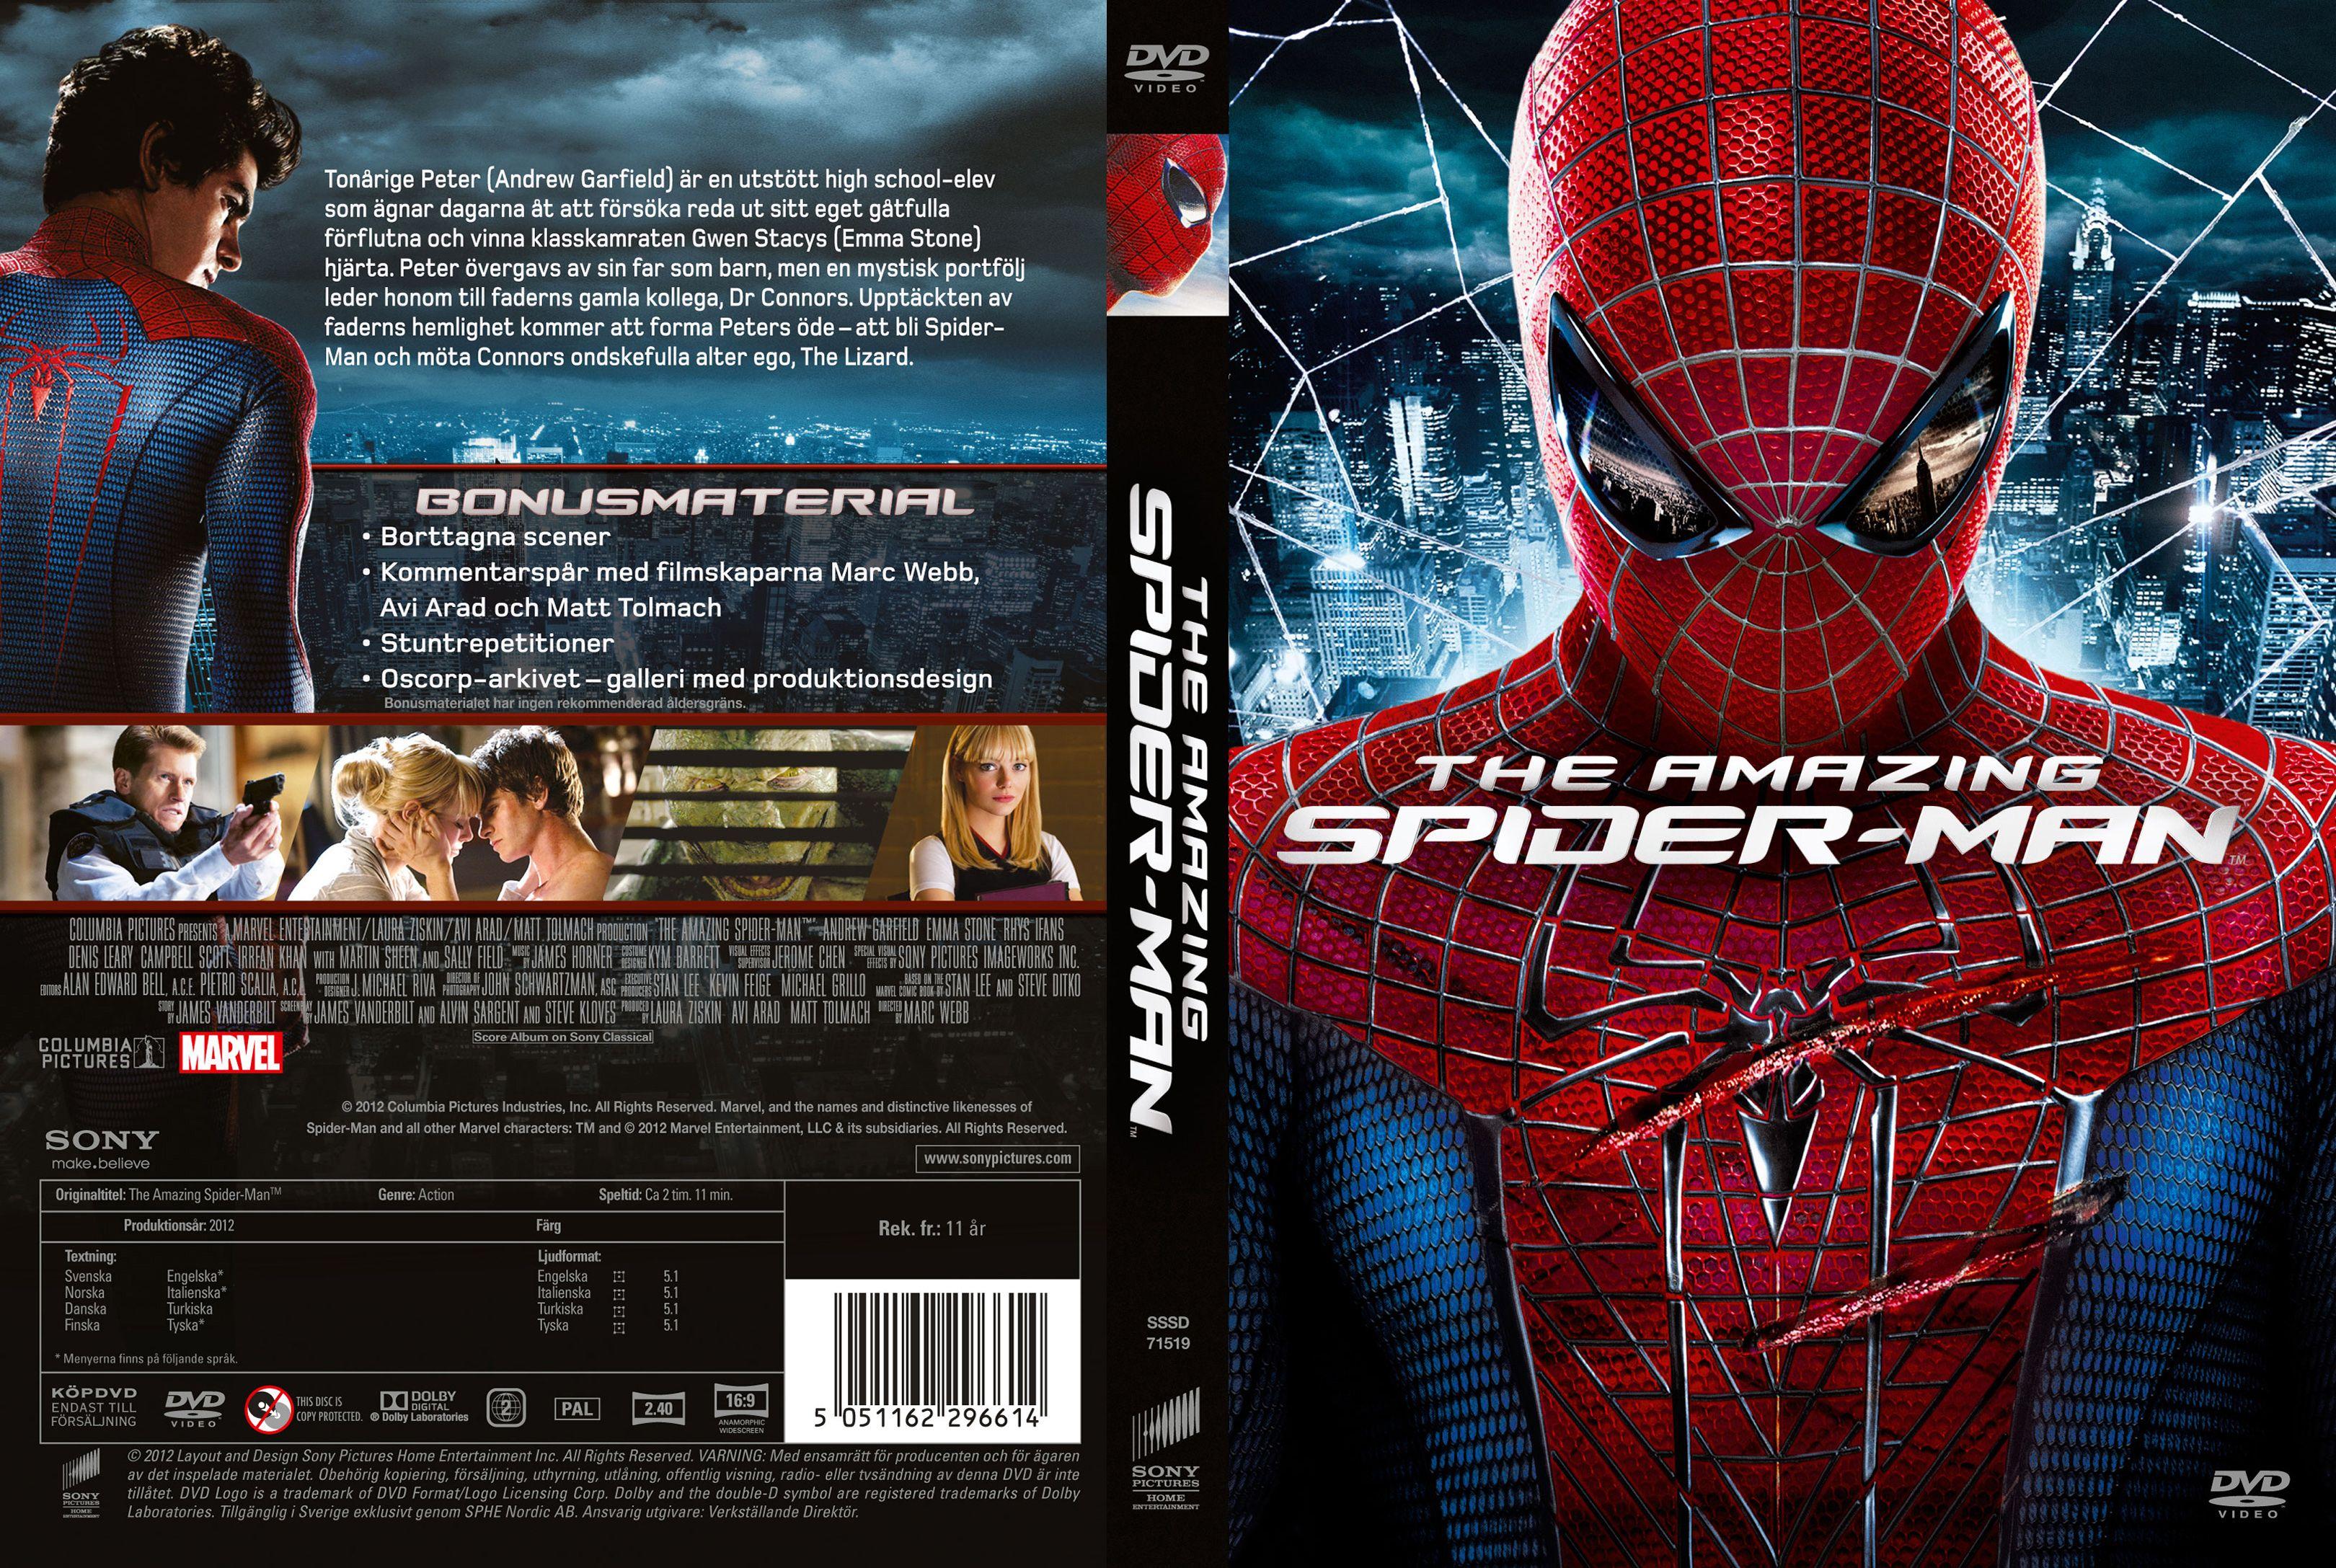 The amazing spider man streaming ita